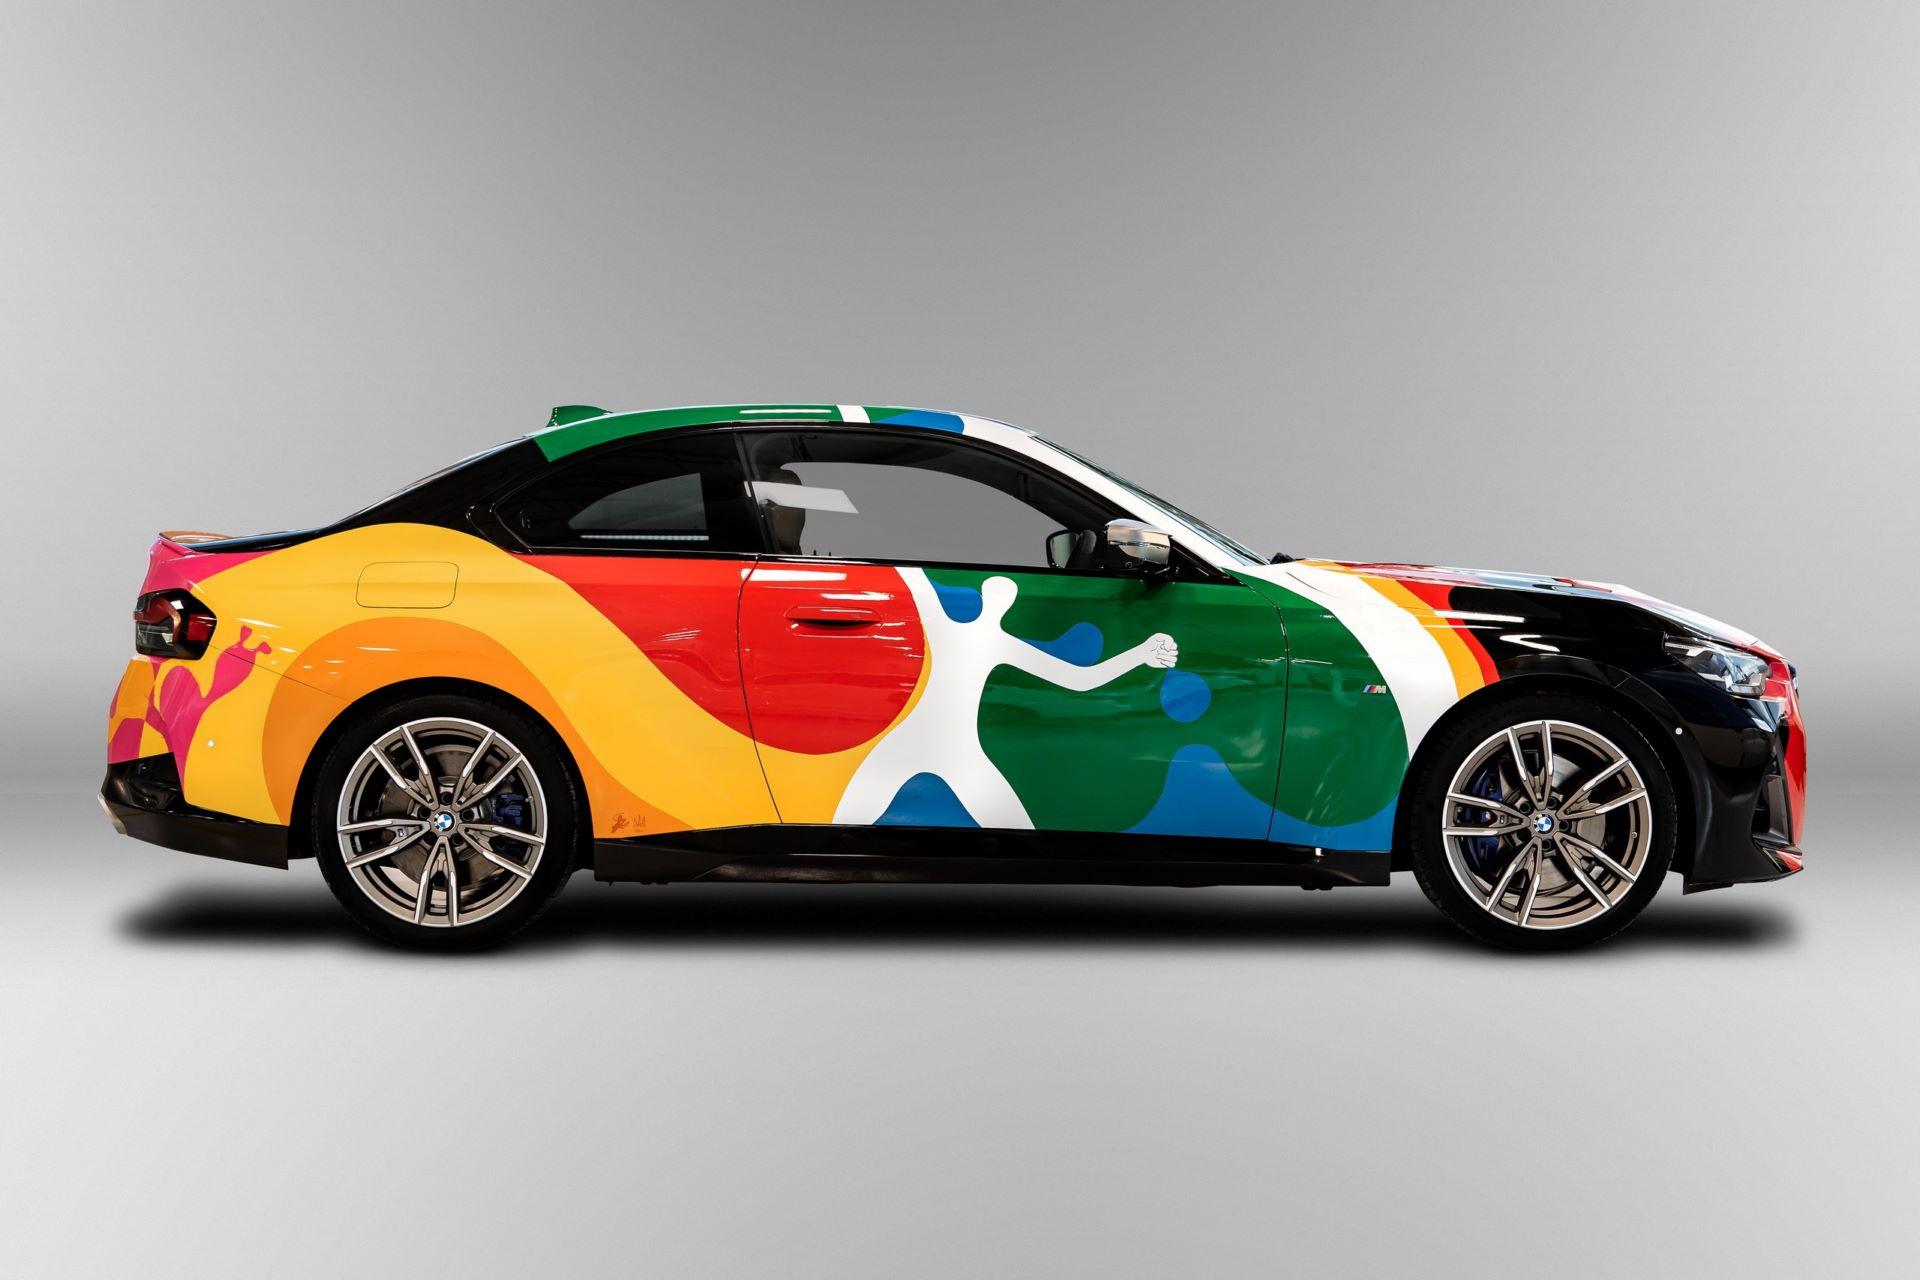 BMW-M240i-2-series-coupe-car-art-3